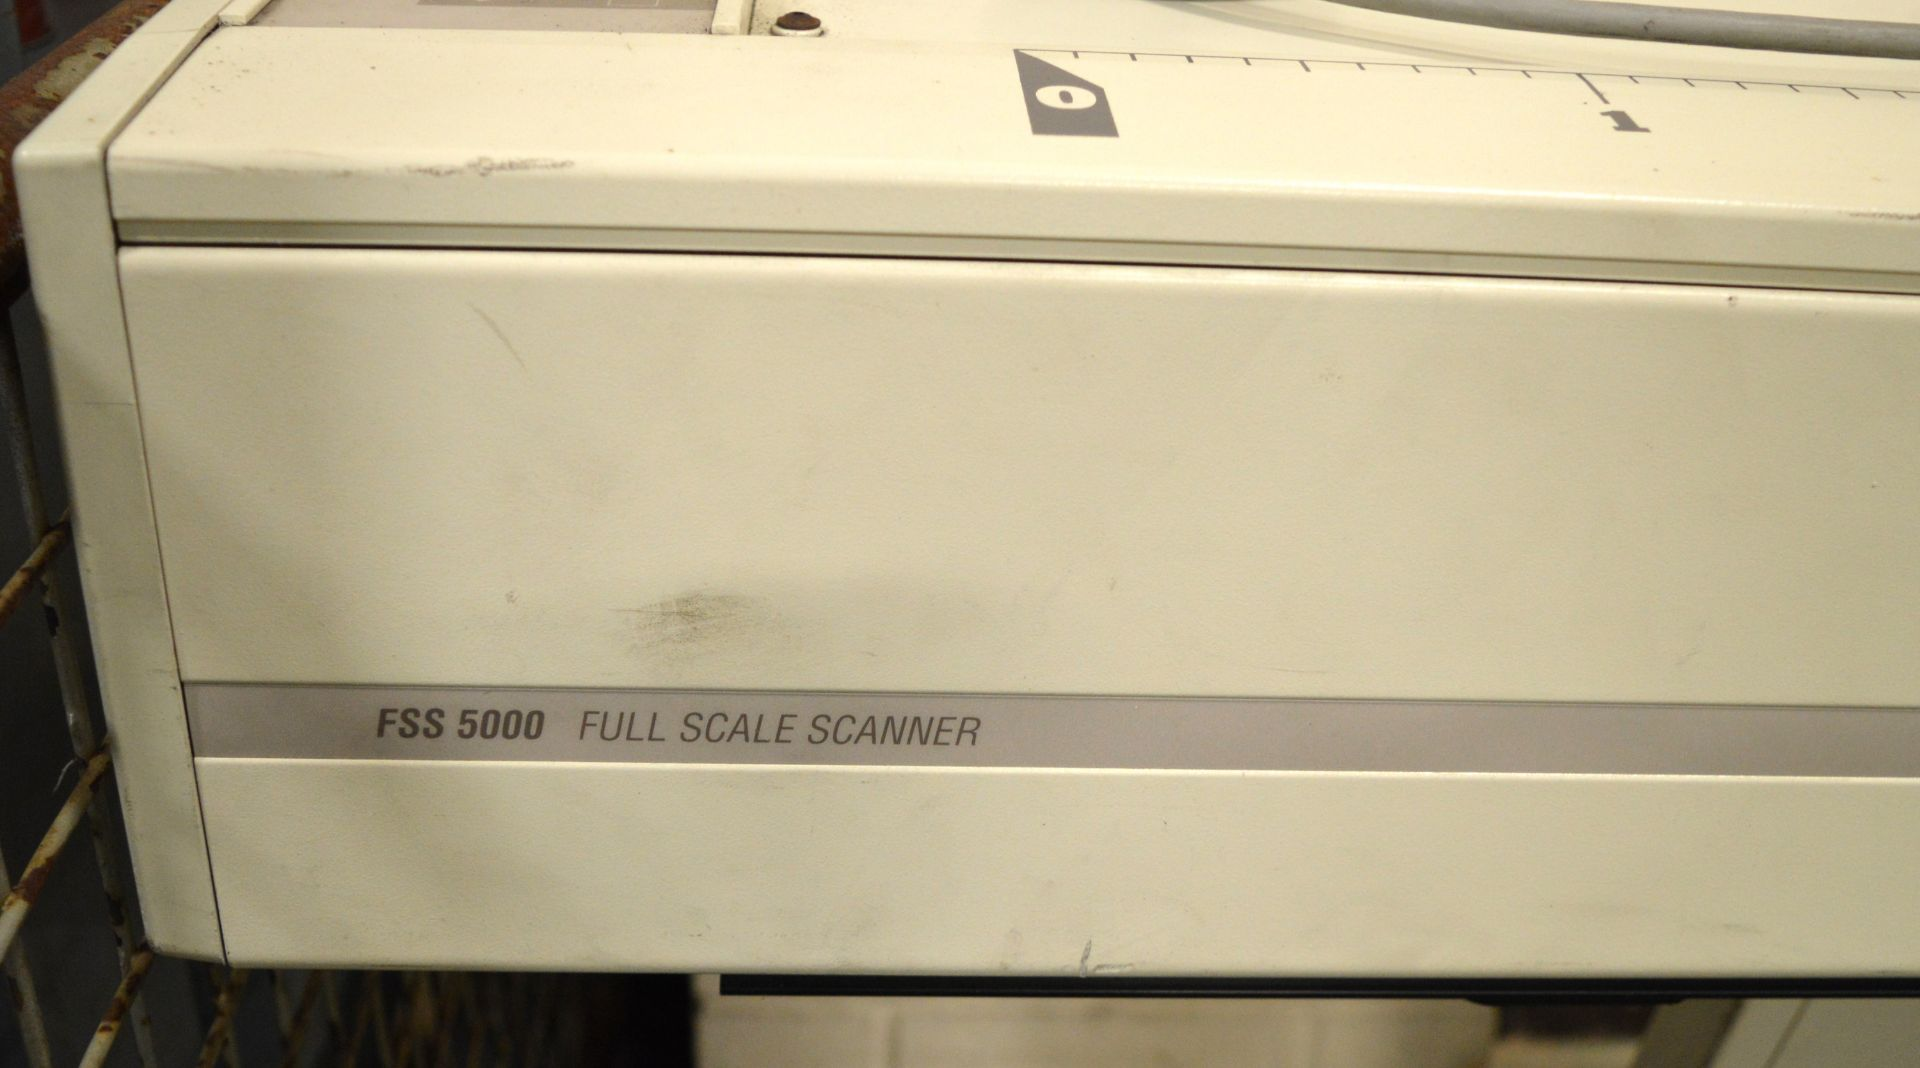 Lot 33 - Contex FSS 5000 Full Scale Scanner.